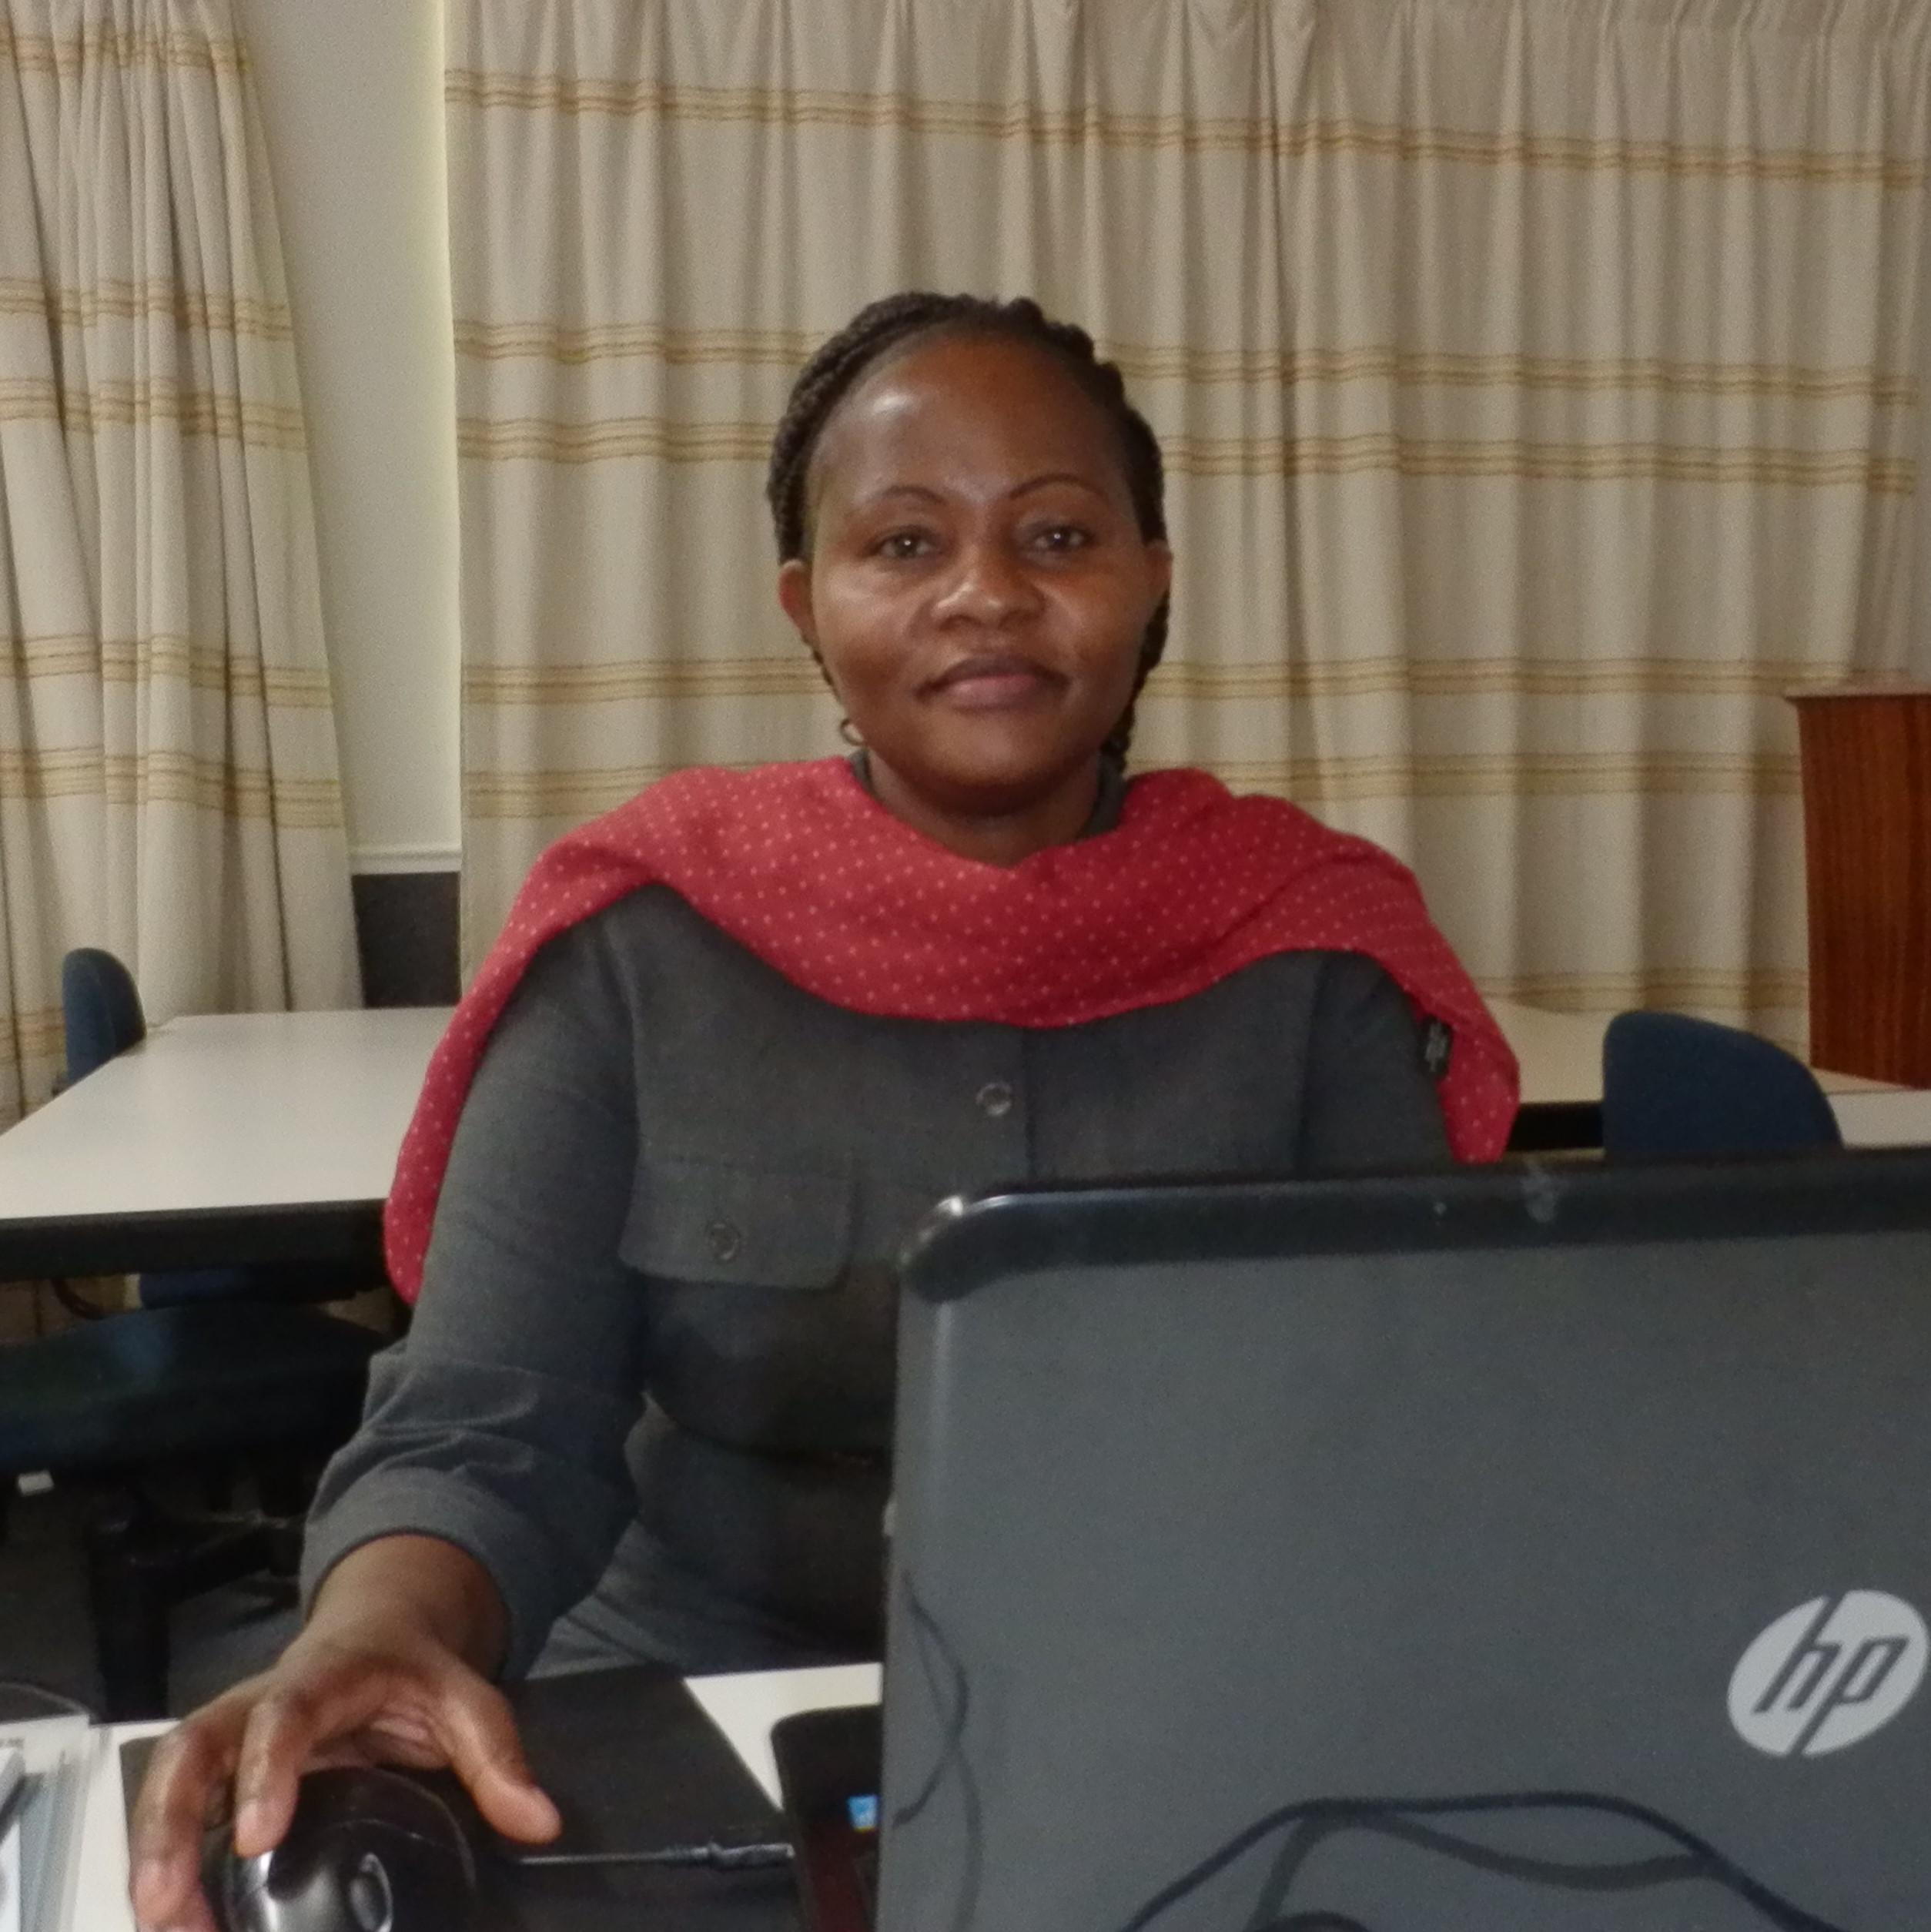 Jacinta Mwende Maweu